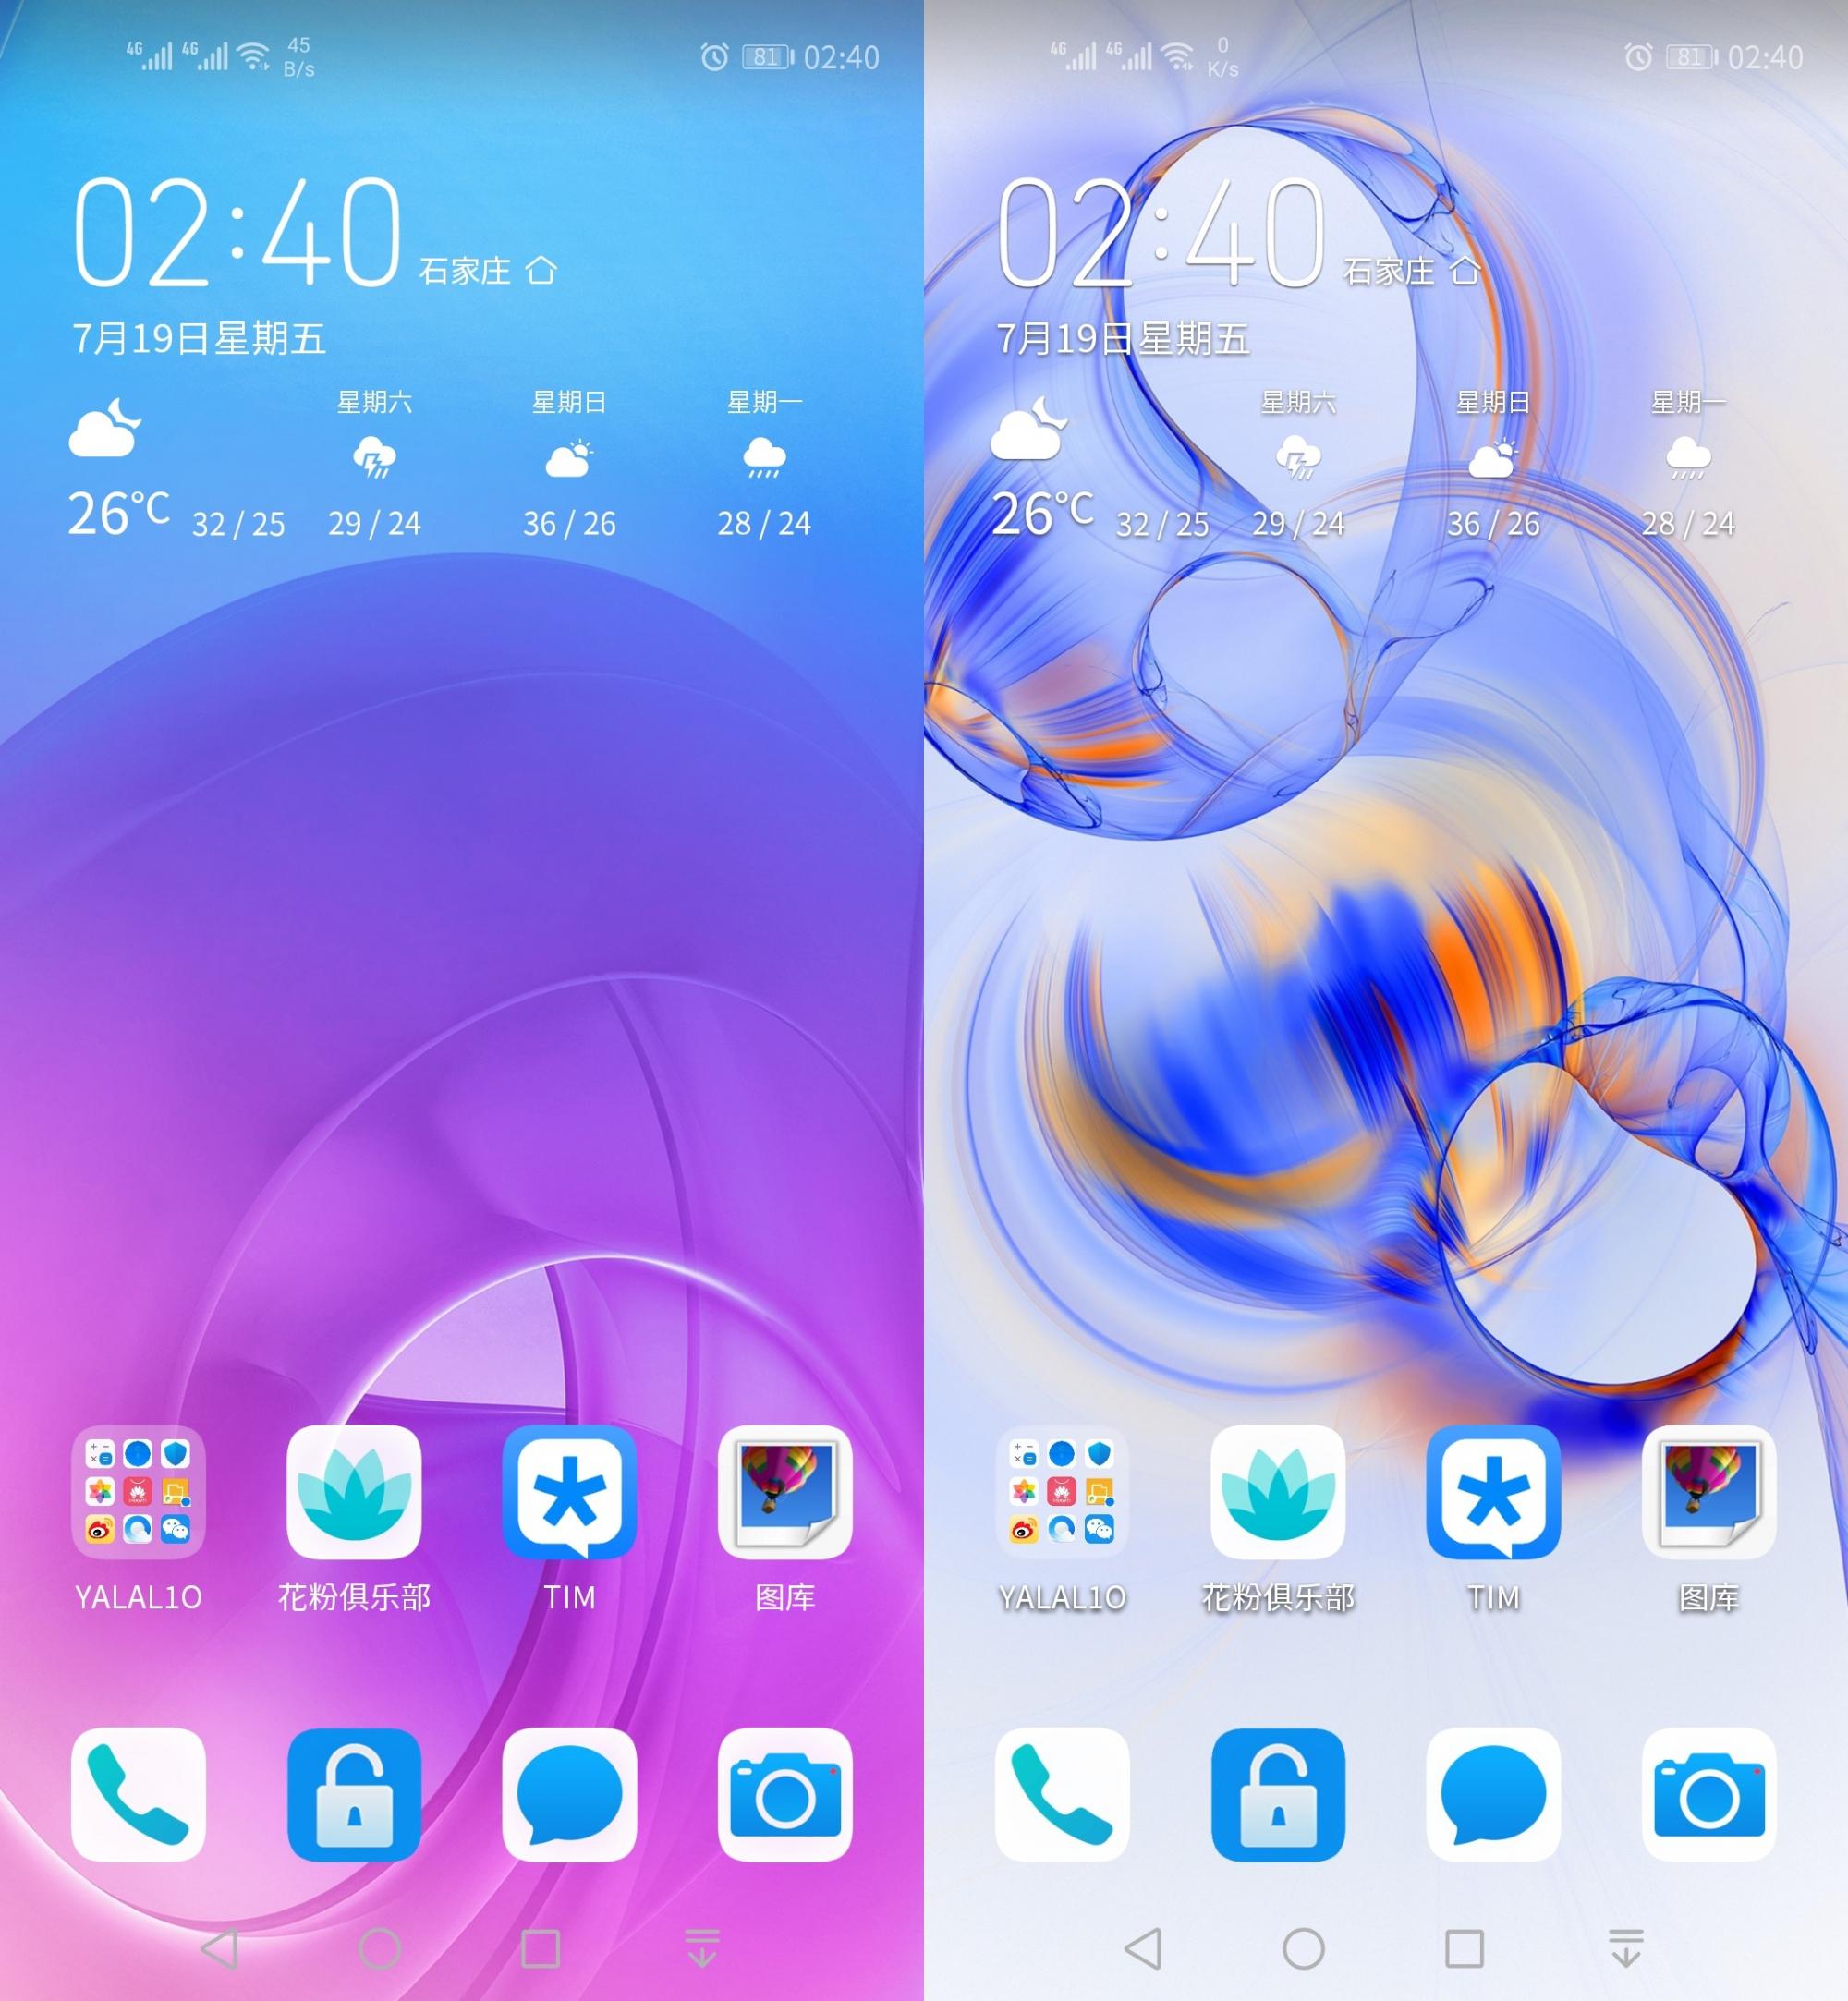 Screenshot_20190719_024021_com.huawei.android.lau.jpg